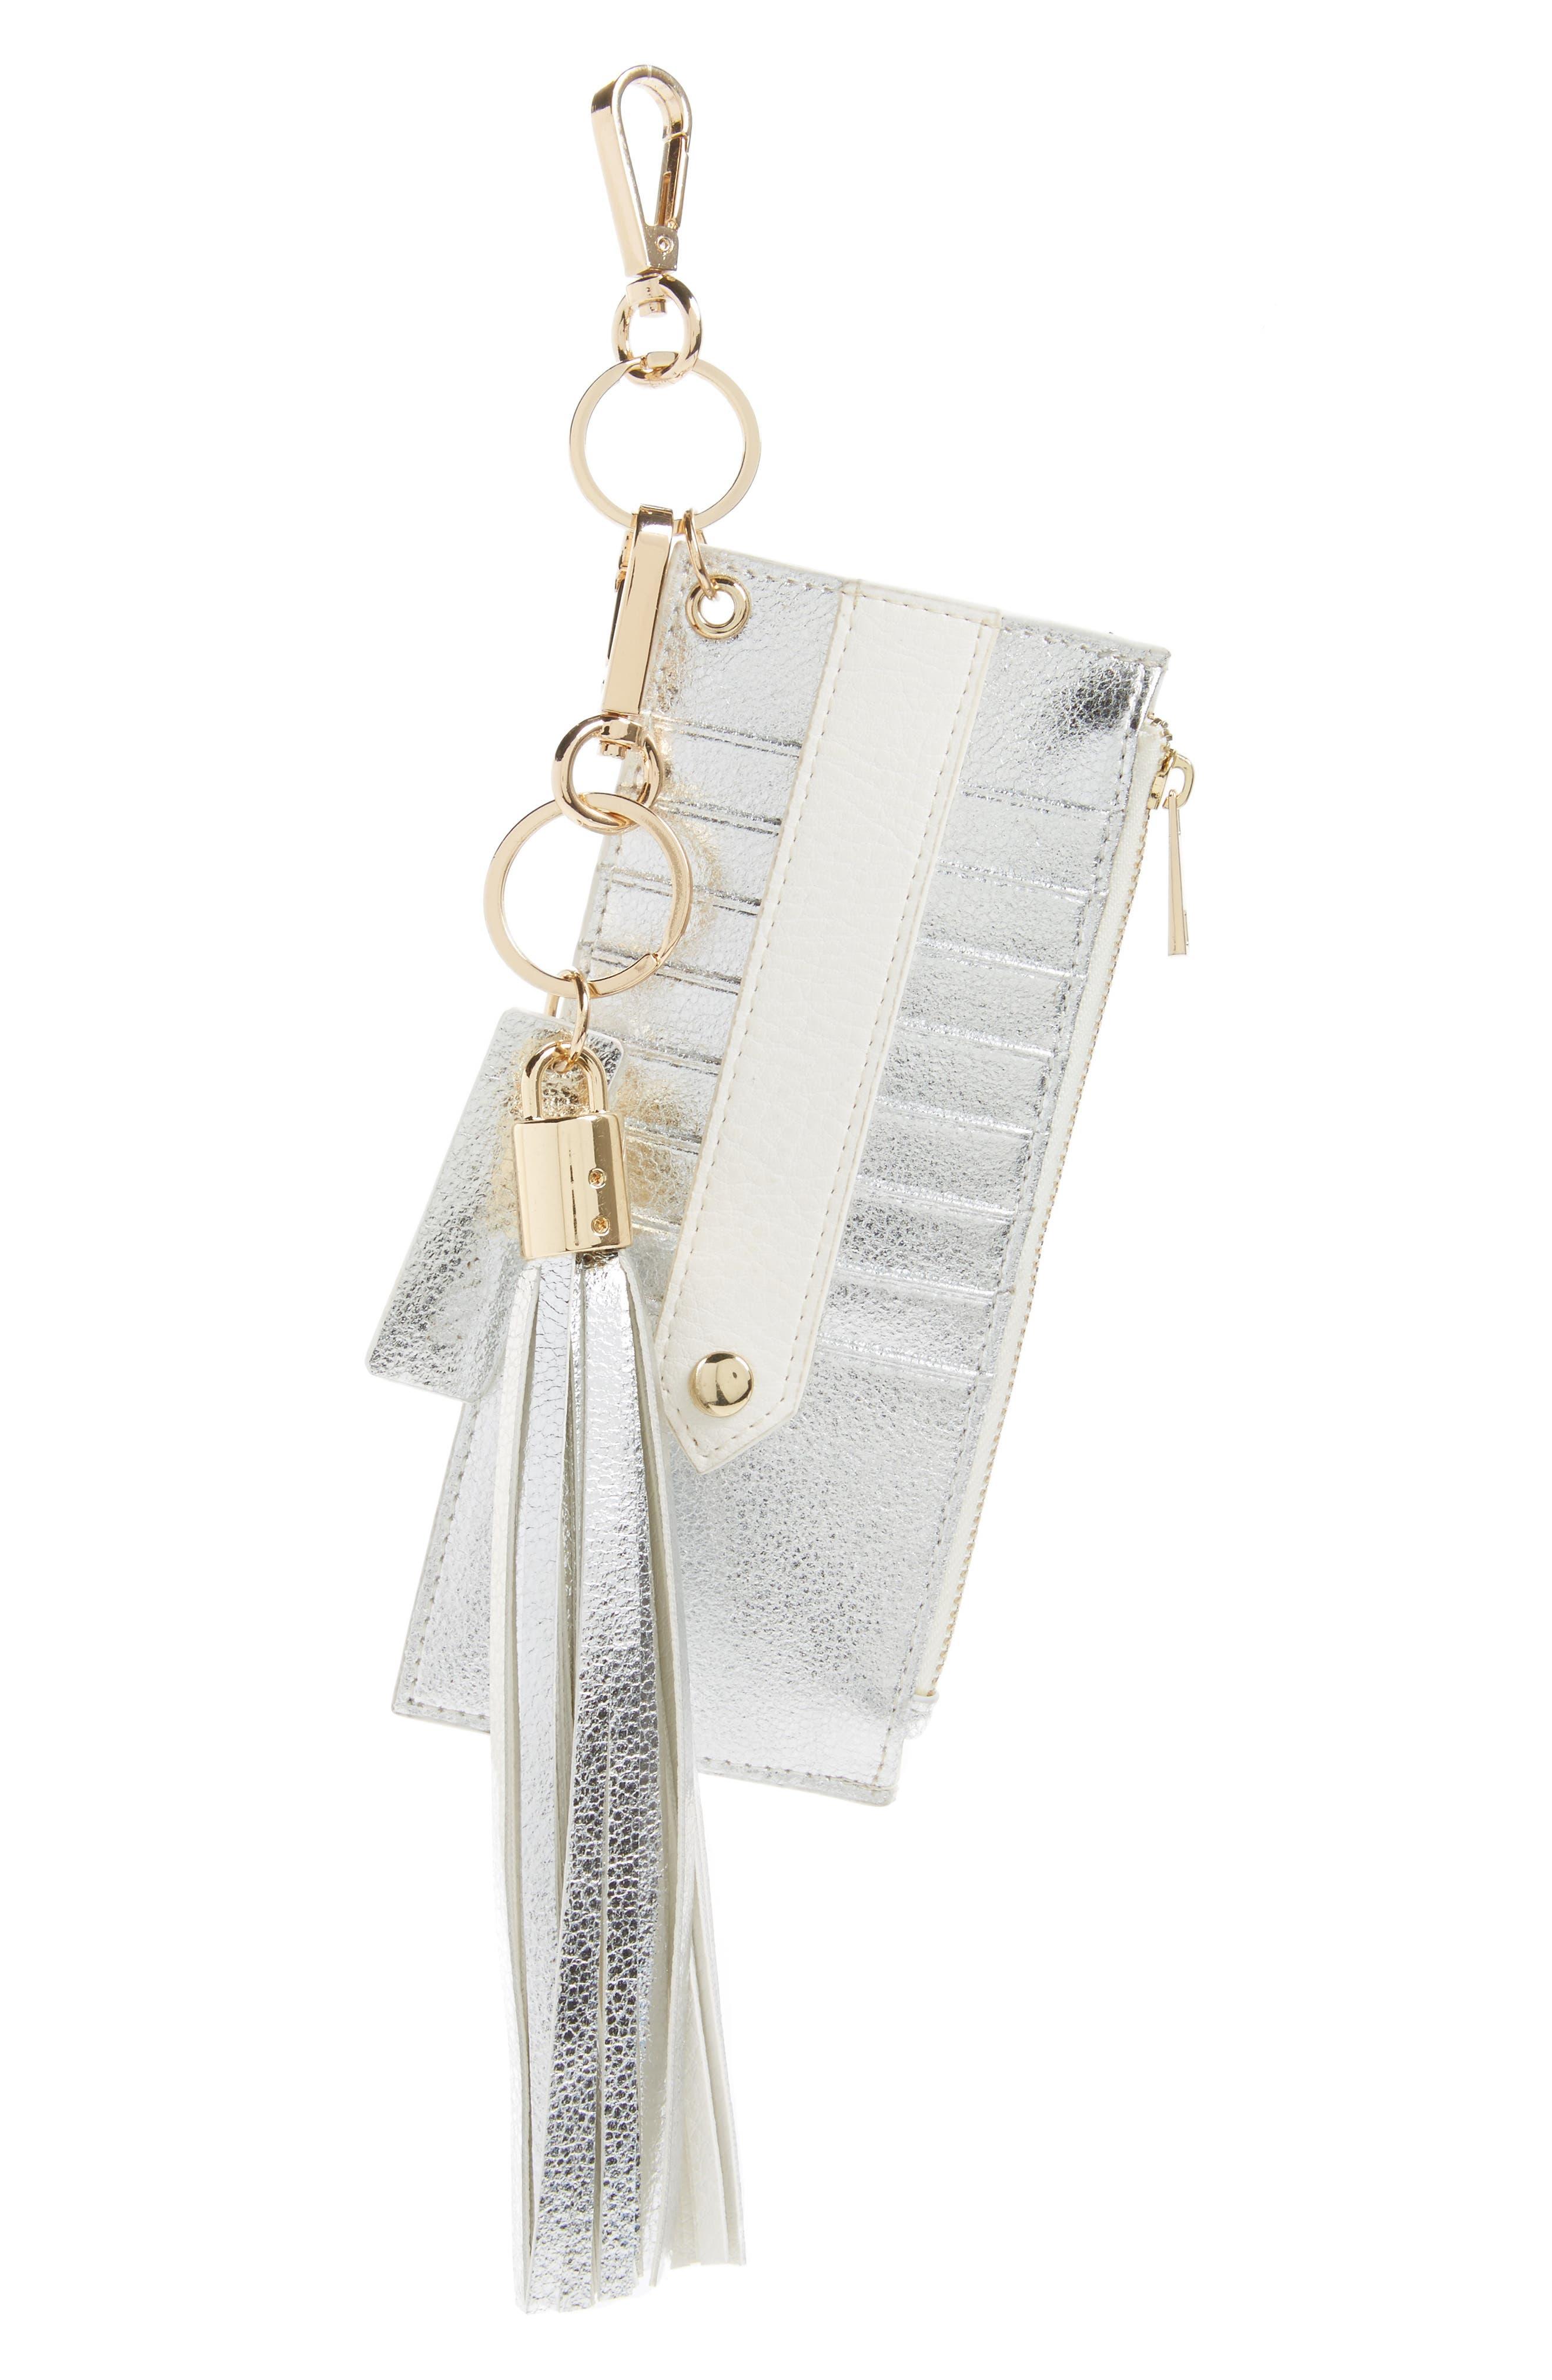 Main Image - Mali + Lili Sydney Faux Leather Card Case with Tassel Charm